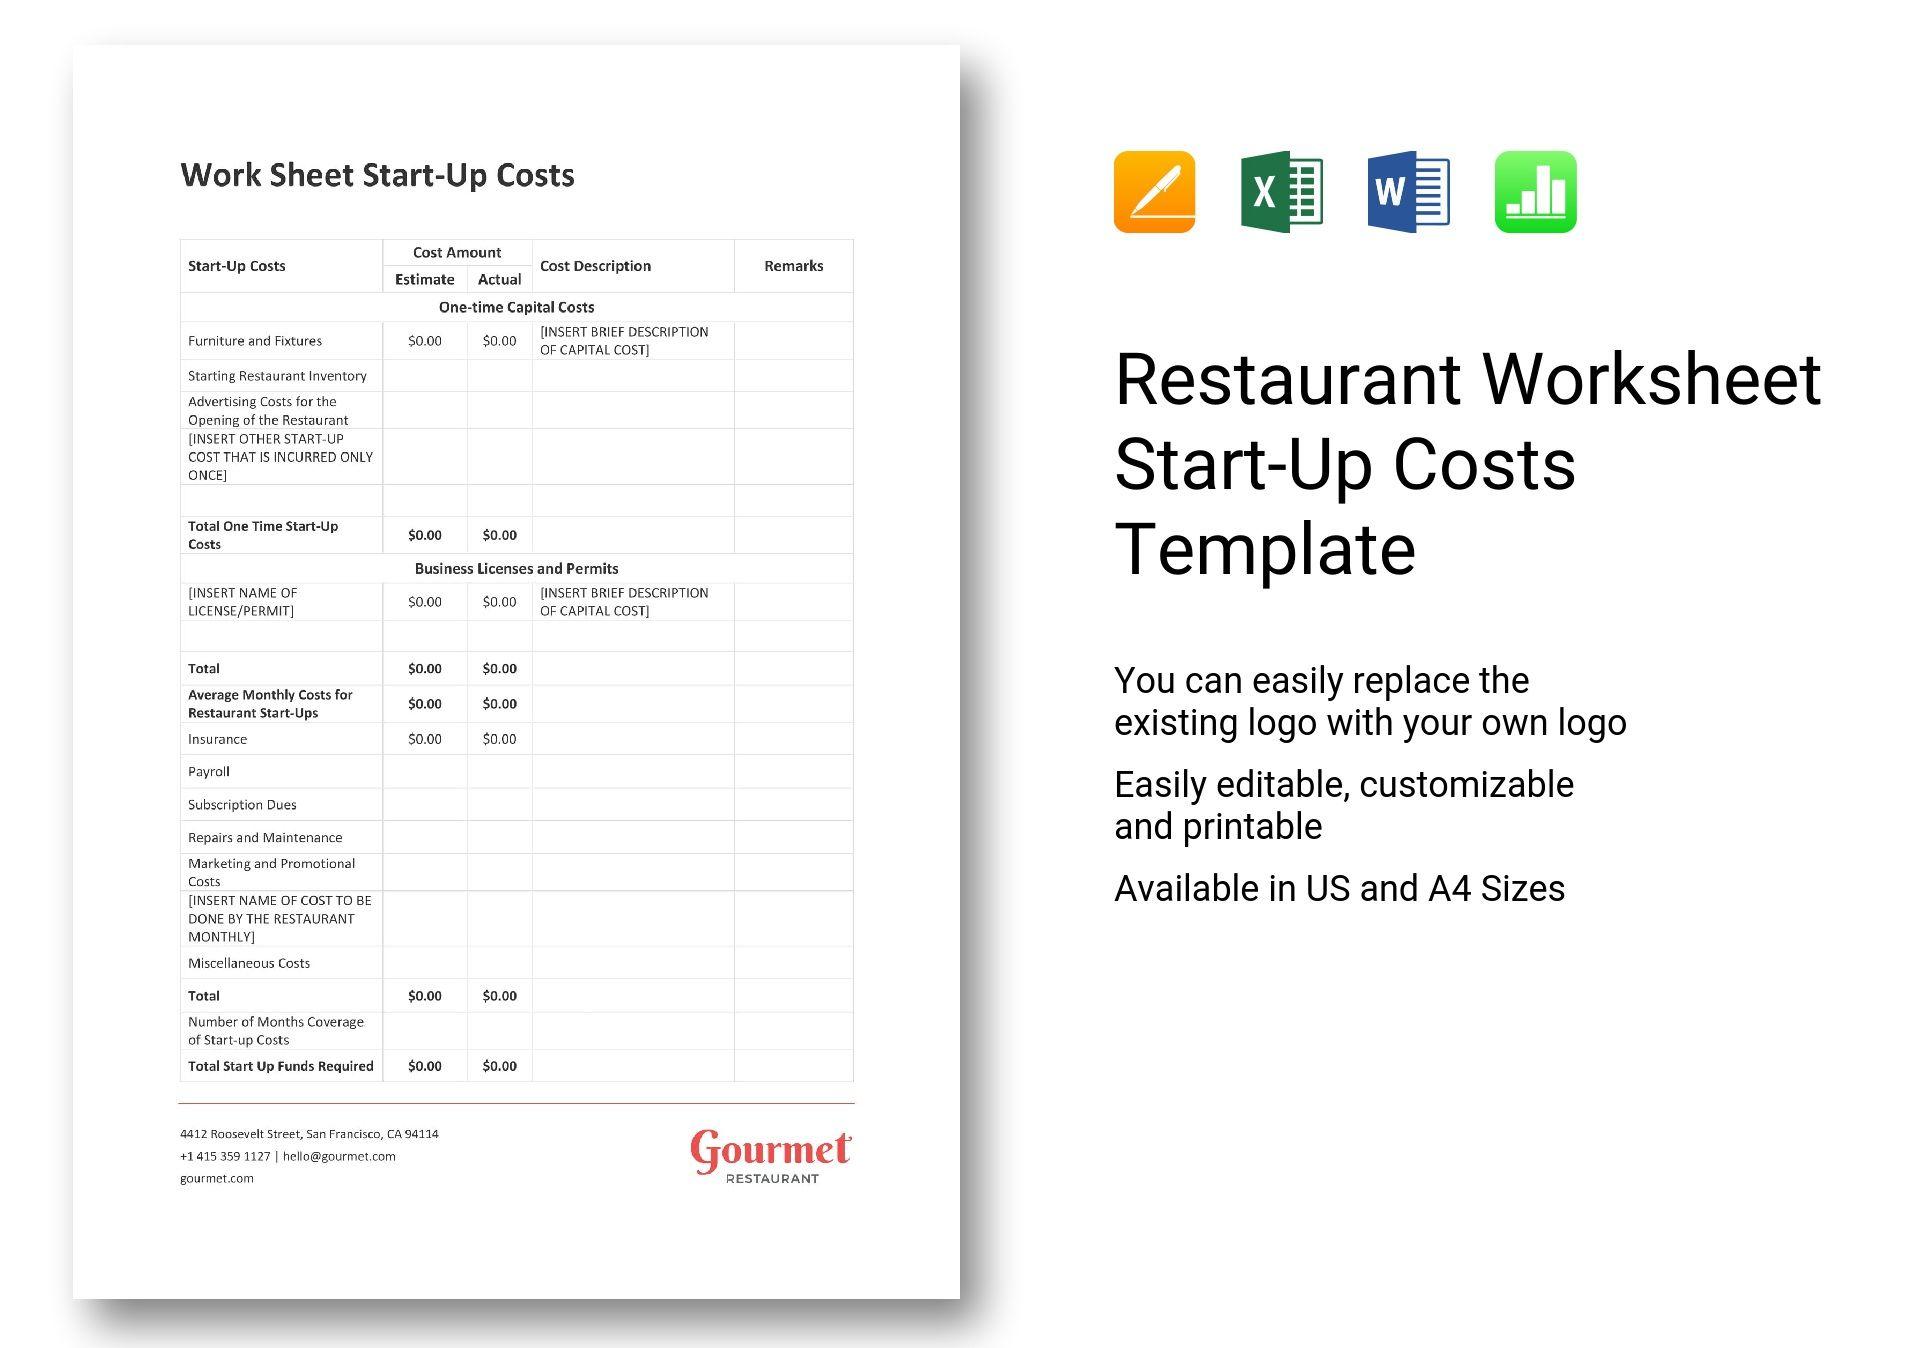 641-Restaurant-Worksheet-Start-Up-Costs-1 Official Business Letter Template on